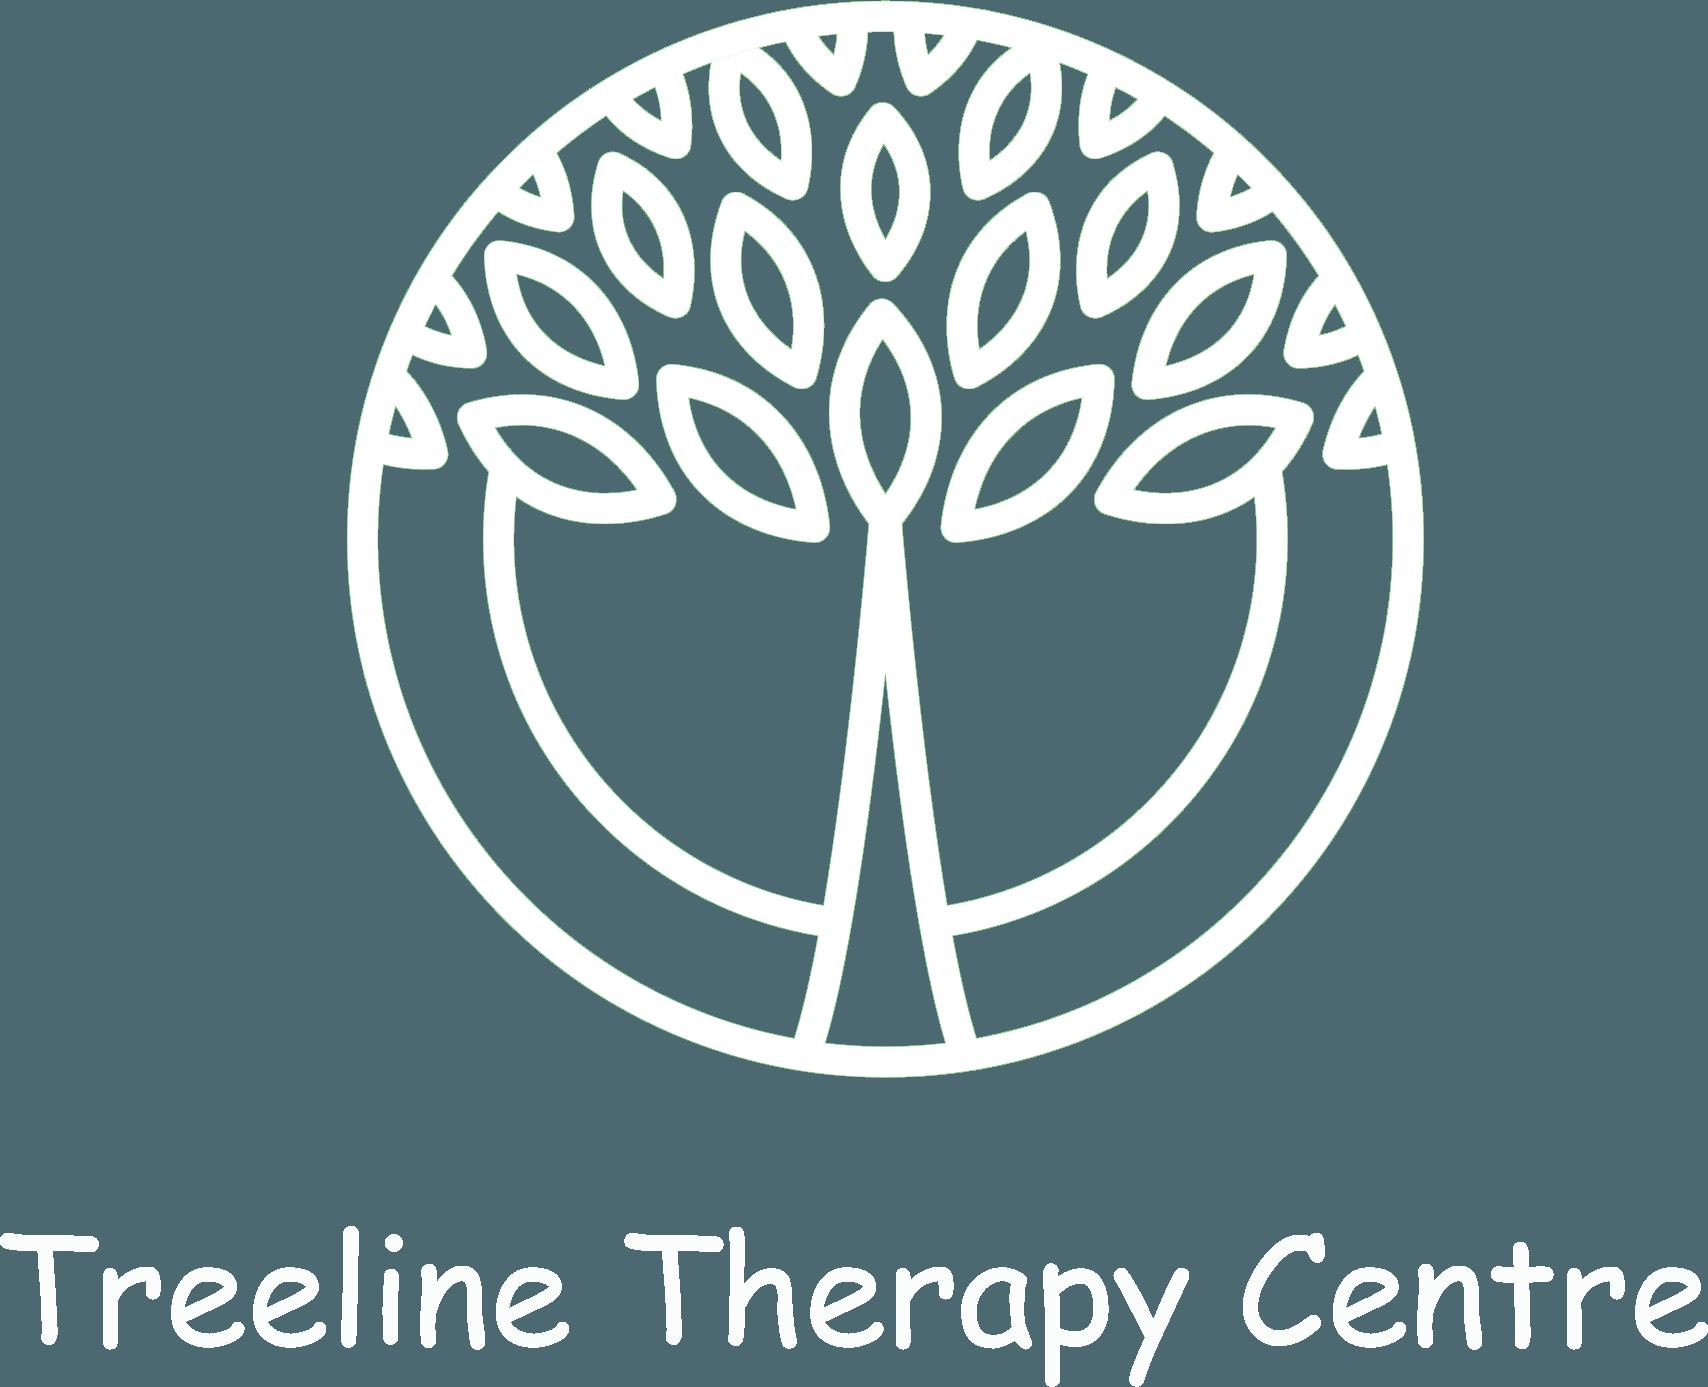 Treeline Therapy Centre Company Logo